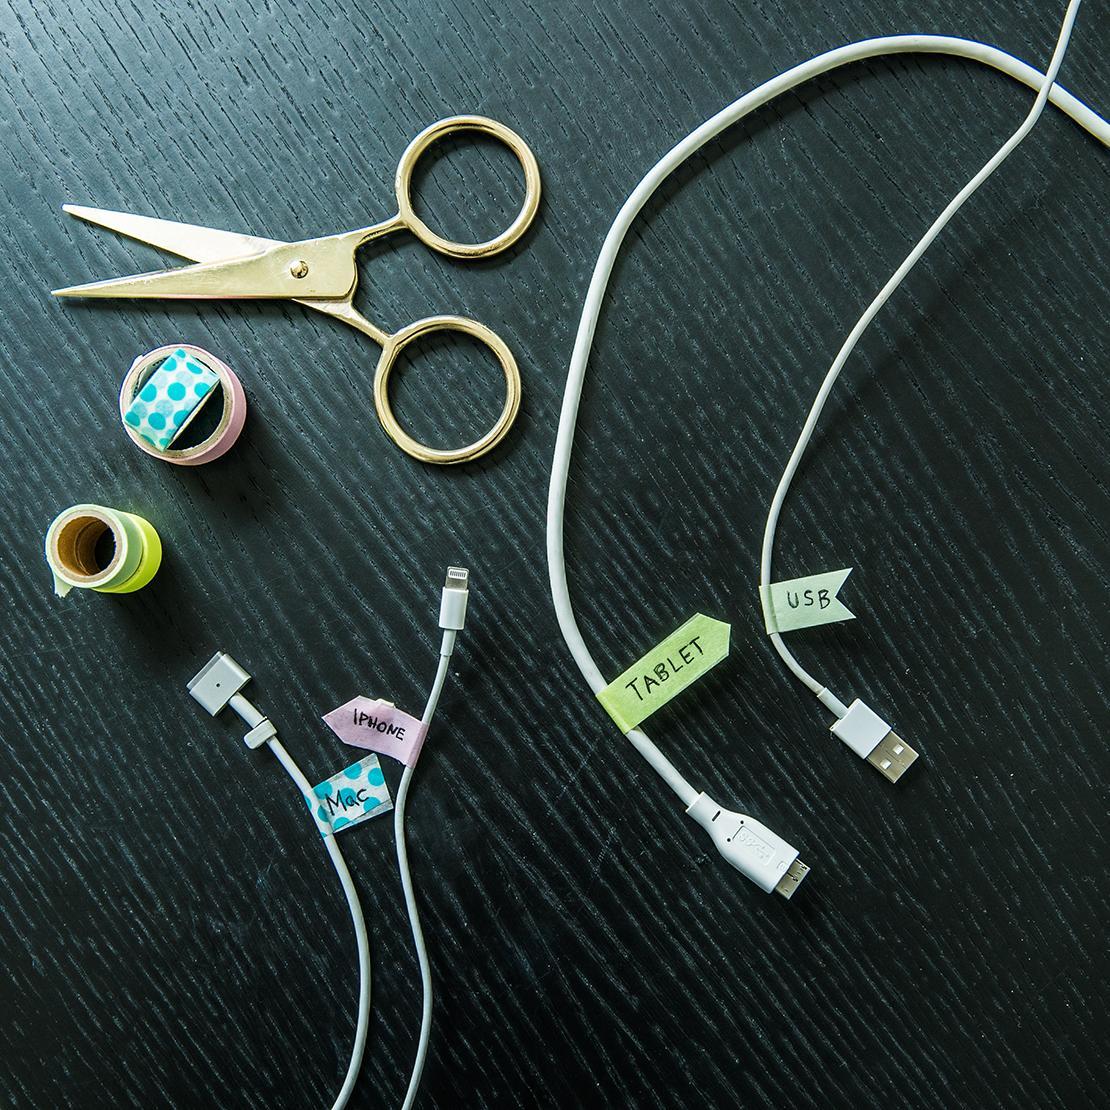 kabels-wegwerken-met-labels